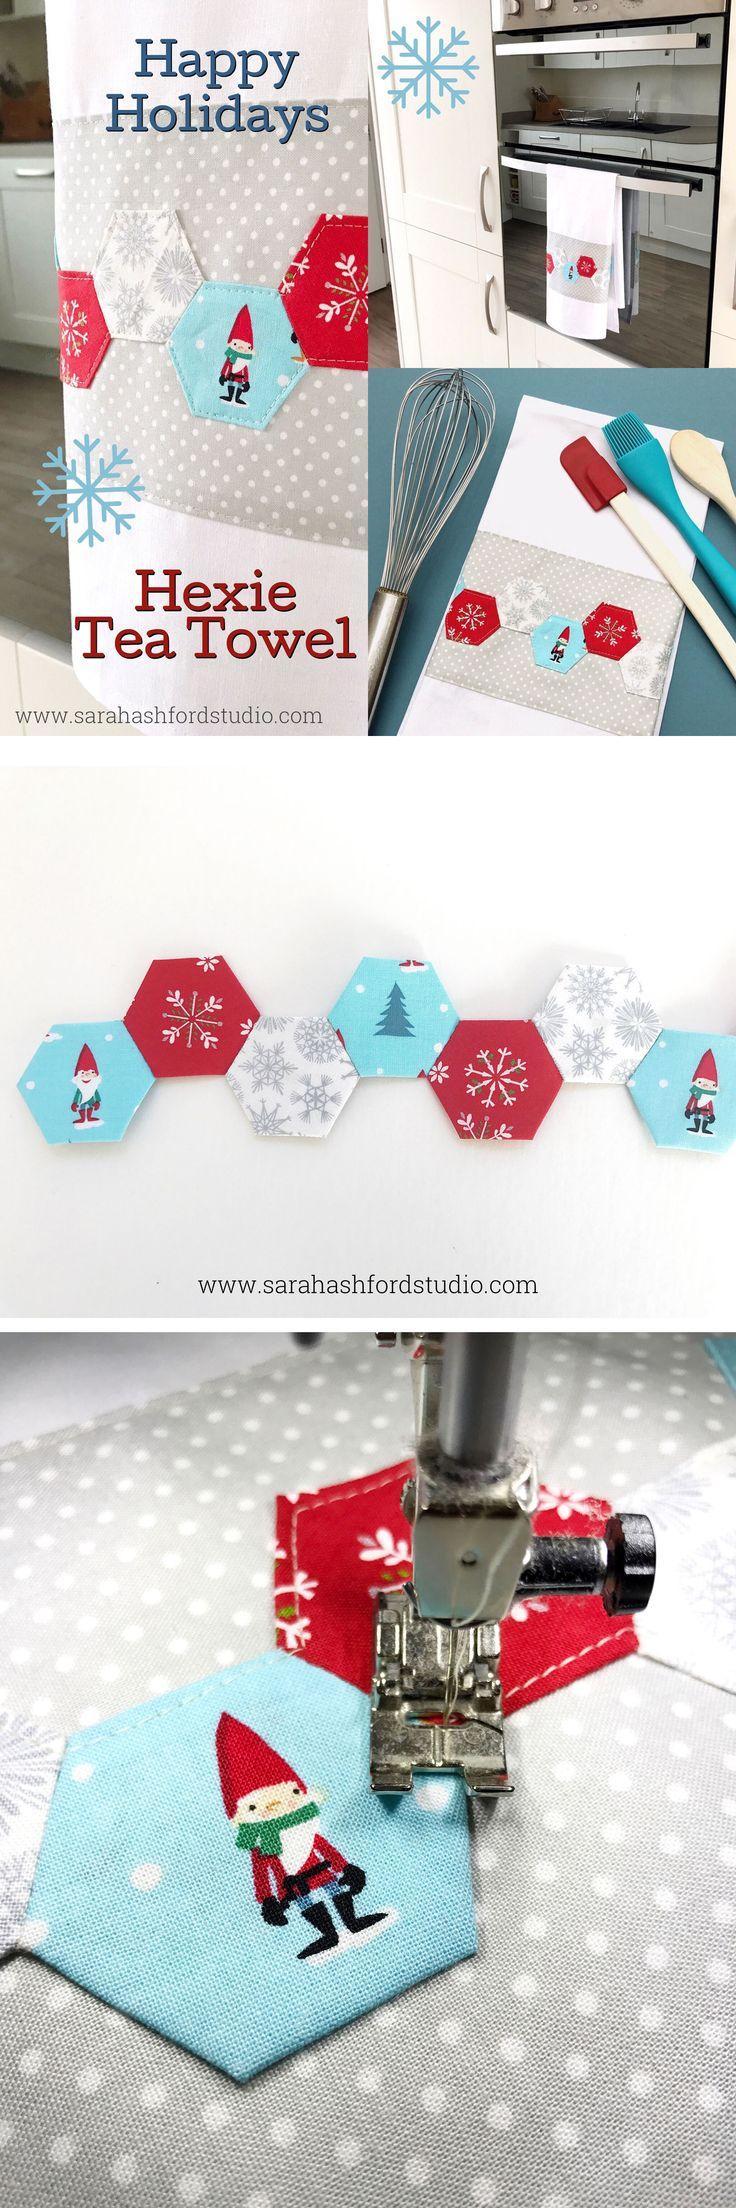 Super cute Christmas Hexie Tea Towel tutorial by Sarah Ashford. Such a fun Christmas gift idea; learn how to sew hexagons! #christmasgifts #christmassewing #hexies #hexagons #hexagontutorial #christmasfabric #teatowel